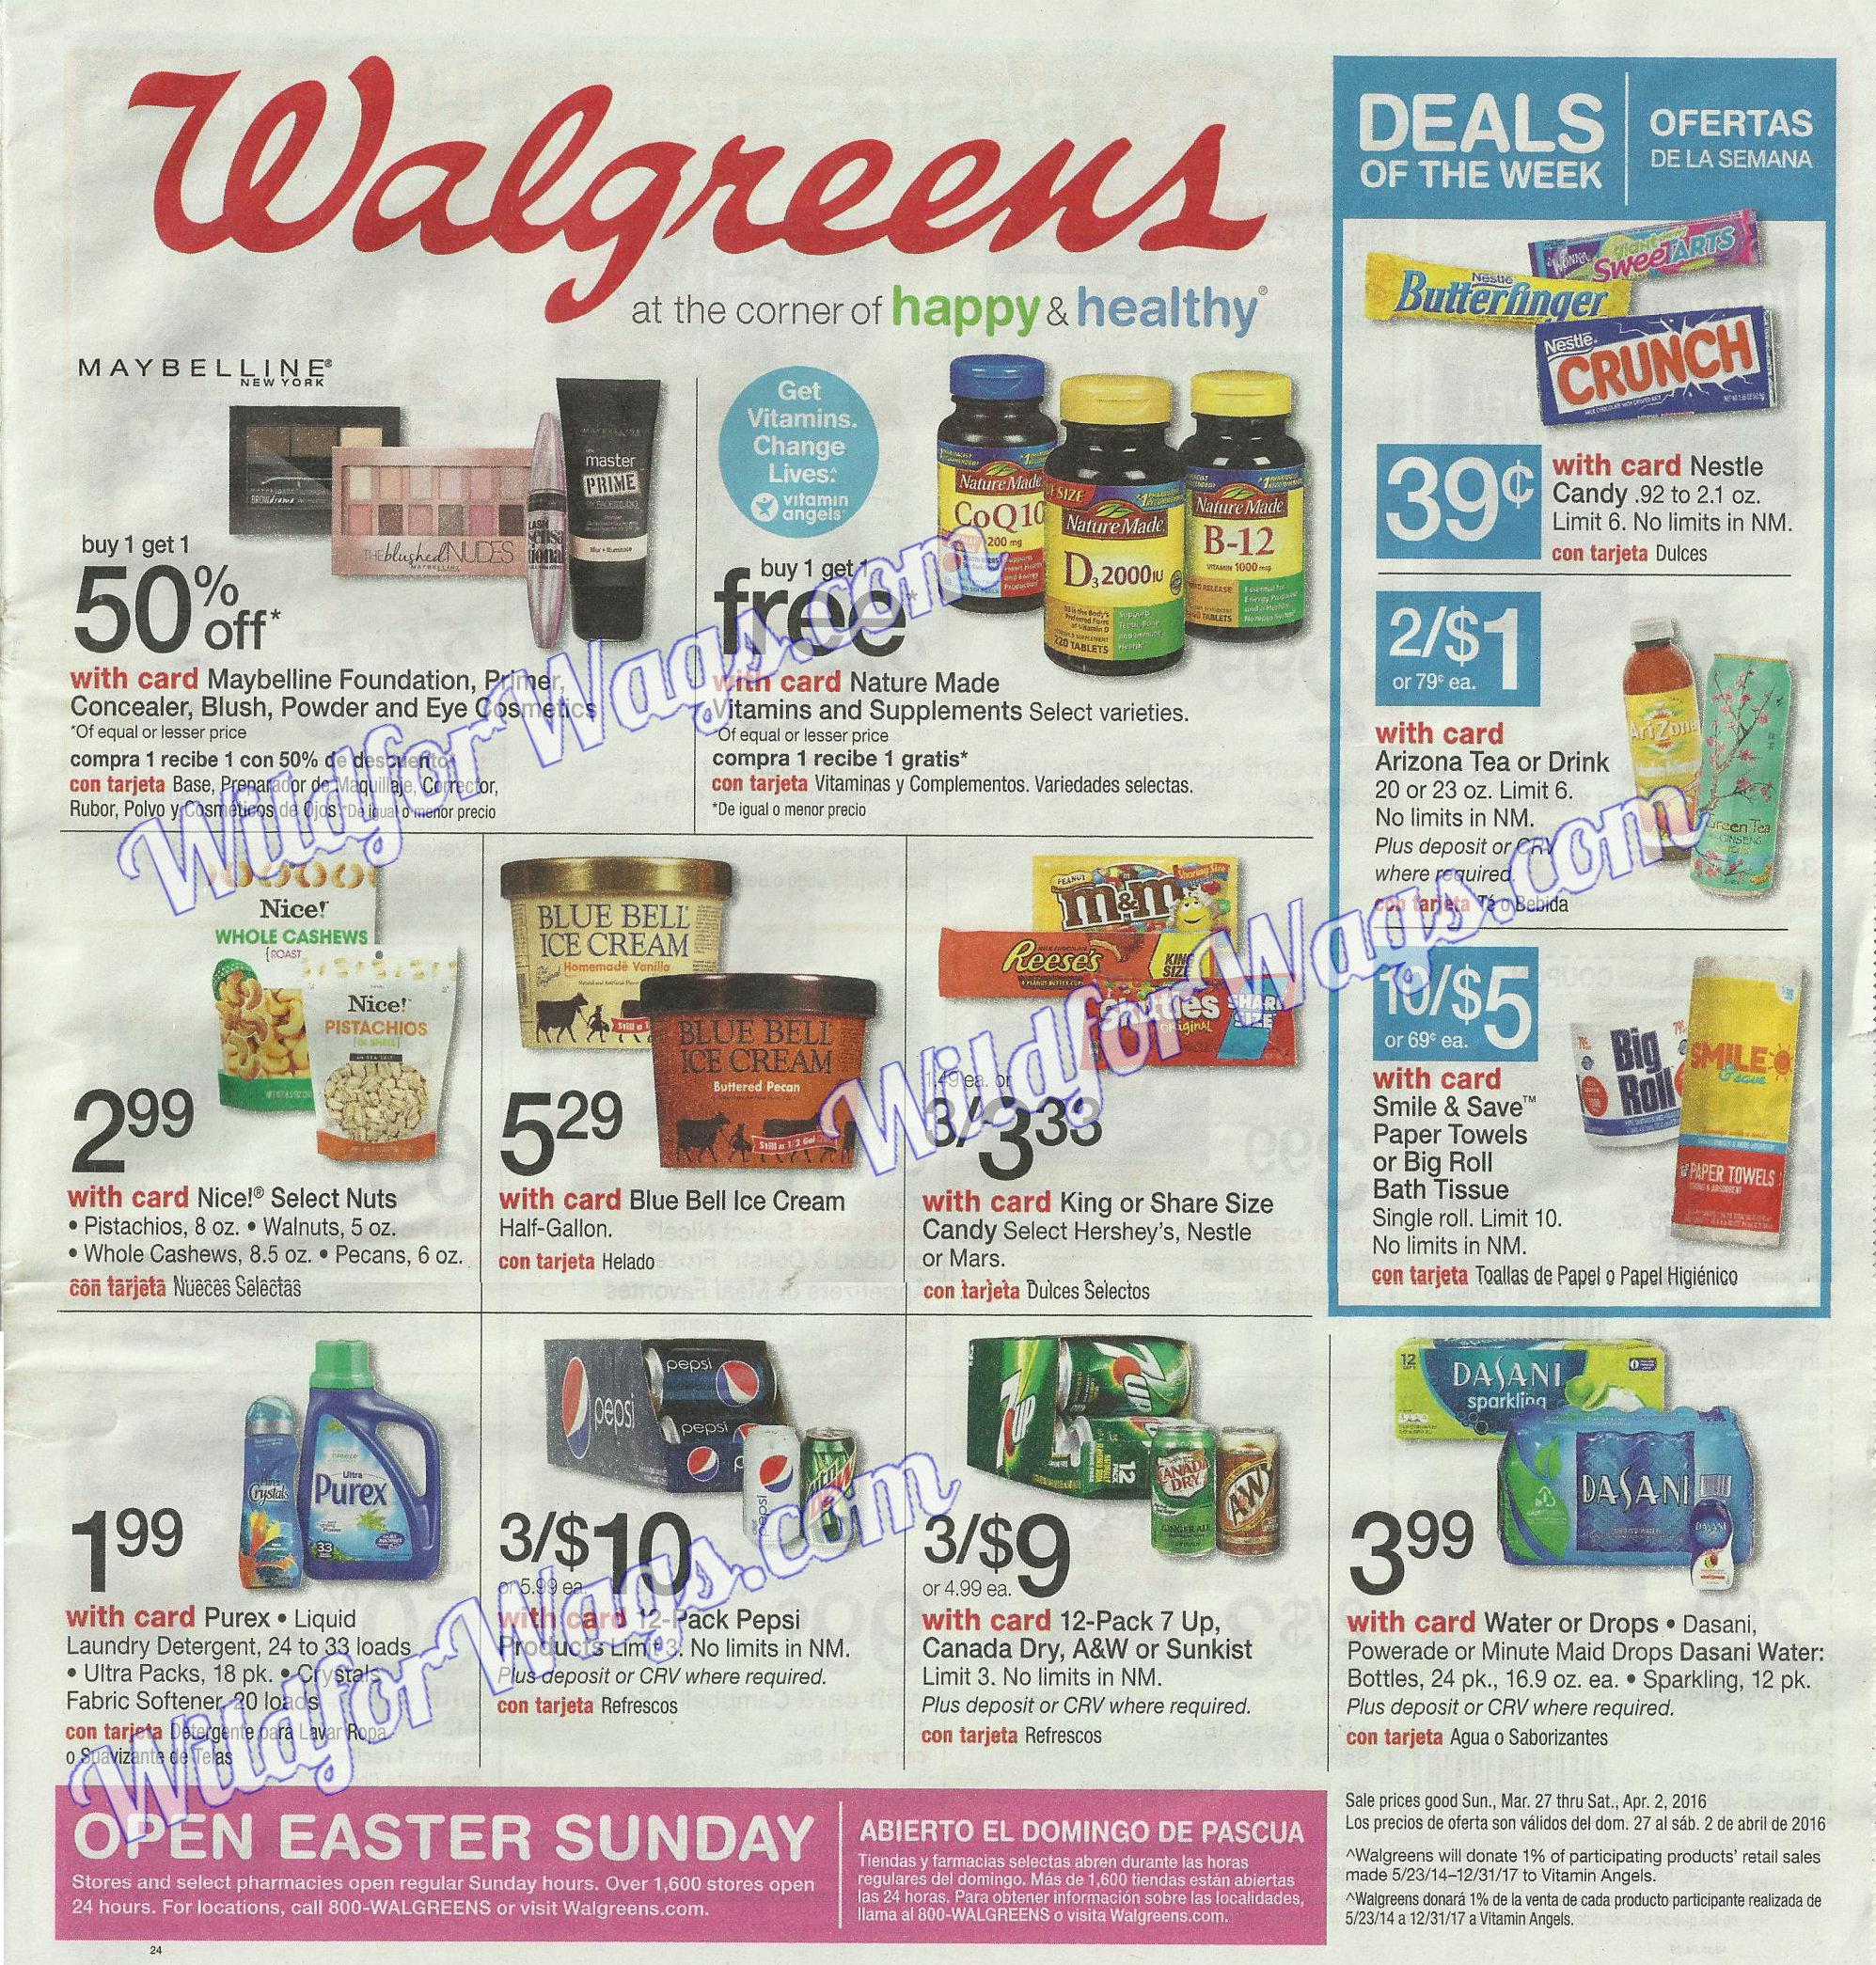 Walgreens black friday coupon match up 2018 / Cashback freebies